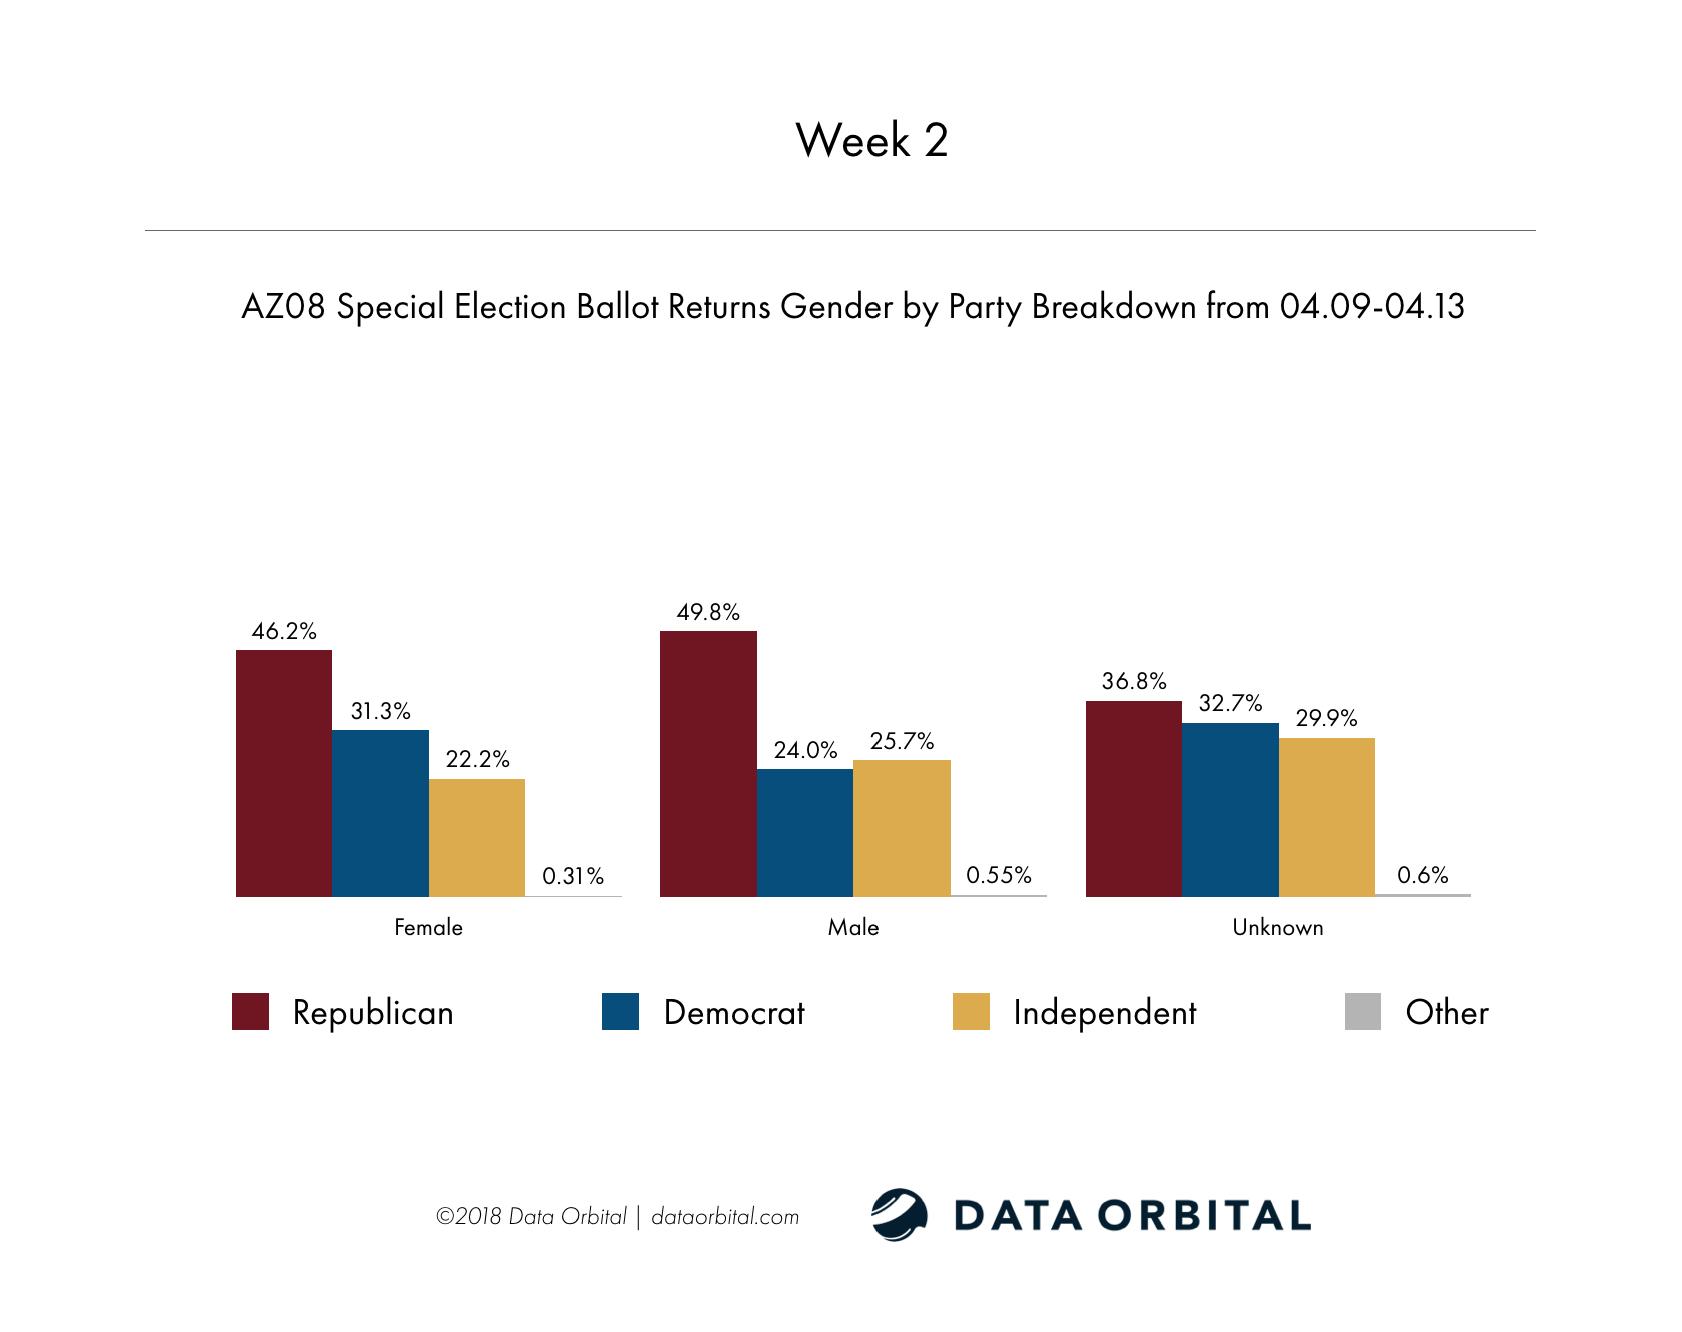 AZ08 Special Election Week 2 Wrap Up Gender by Party Breakdown Week 2